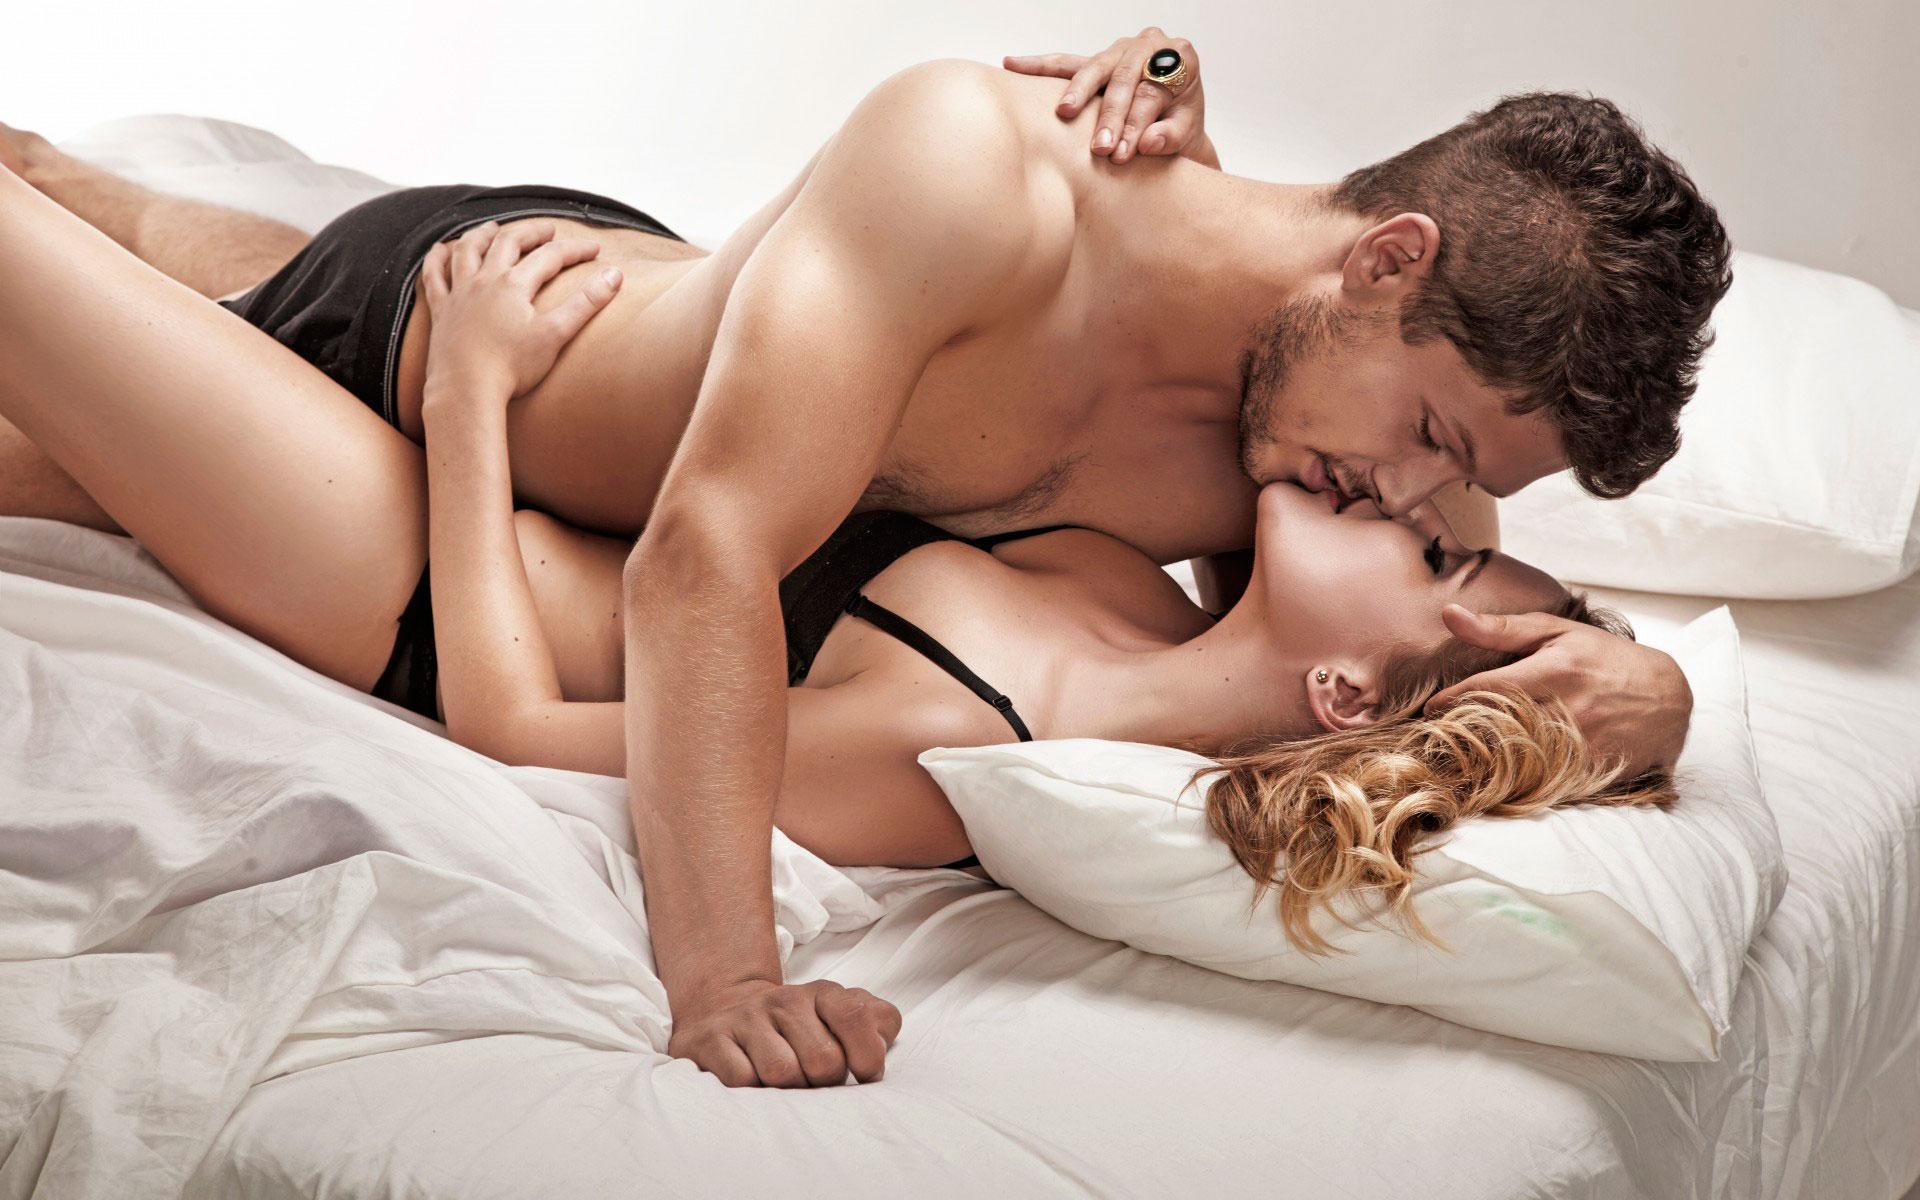 Видео про секс парное в пастели фото 391-598